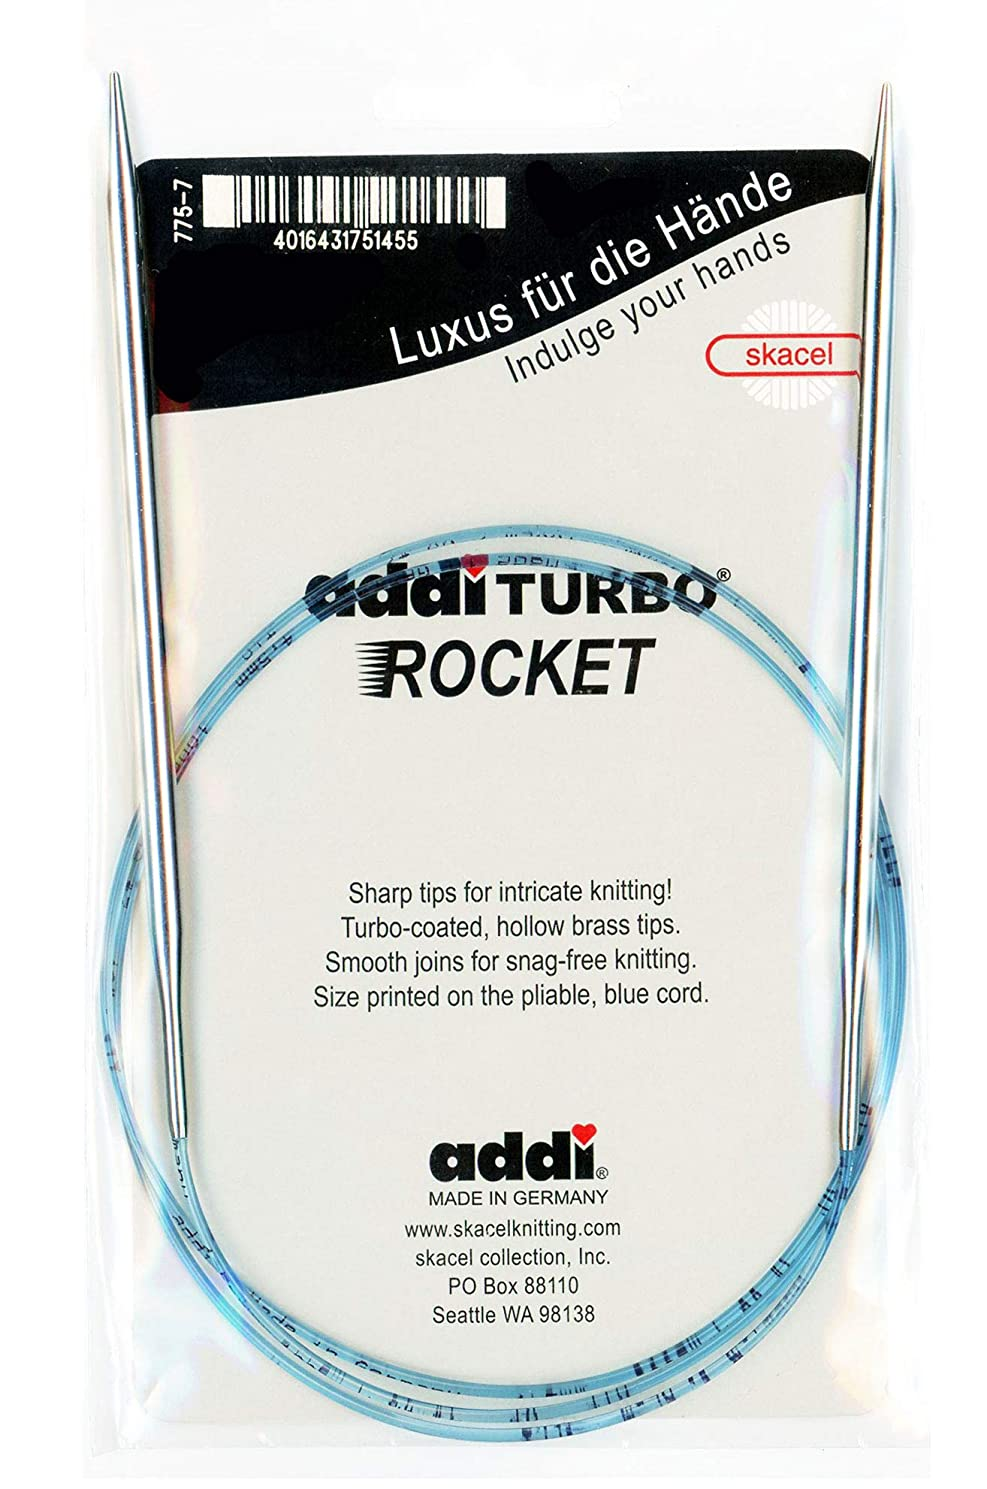 addi Knitting Needle Circular Turbo Rocket Lace Skacel Exclusive Blue Cord 40 inch (100cm) Size US 08 (5.0mm)